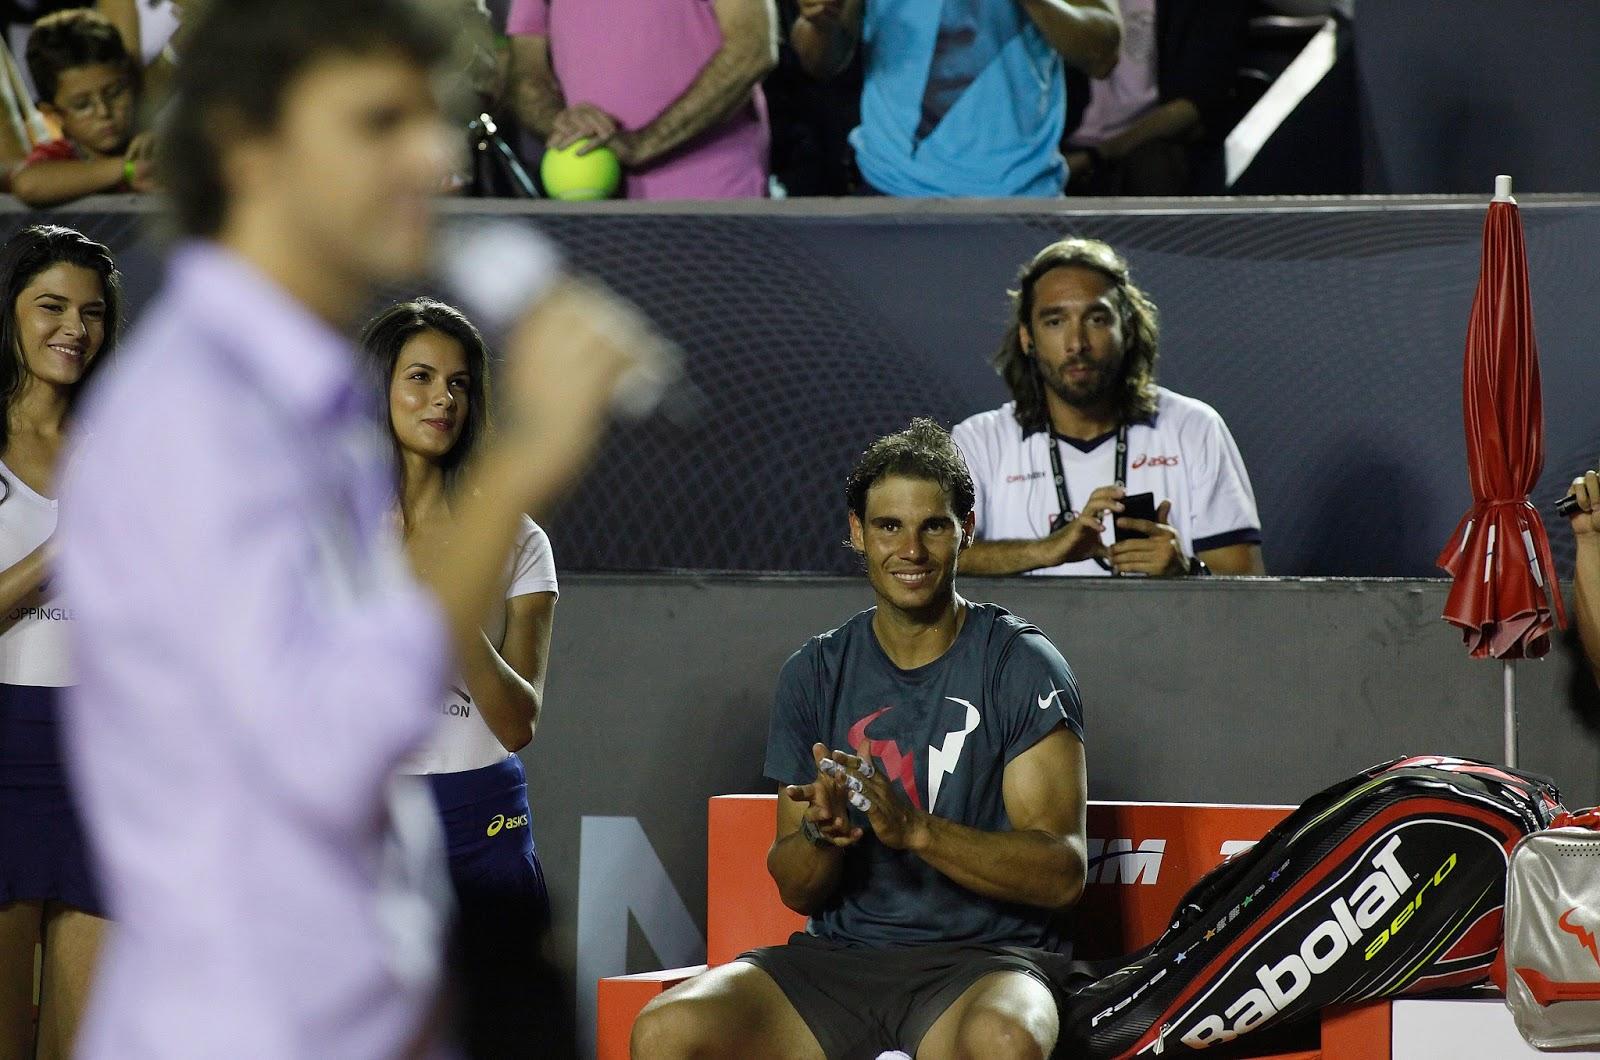 Rafaholics Rio Open Rafa Nadal & Gustavo Kuerten HQ s